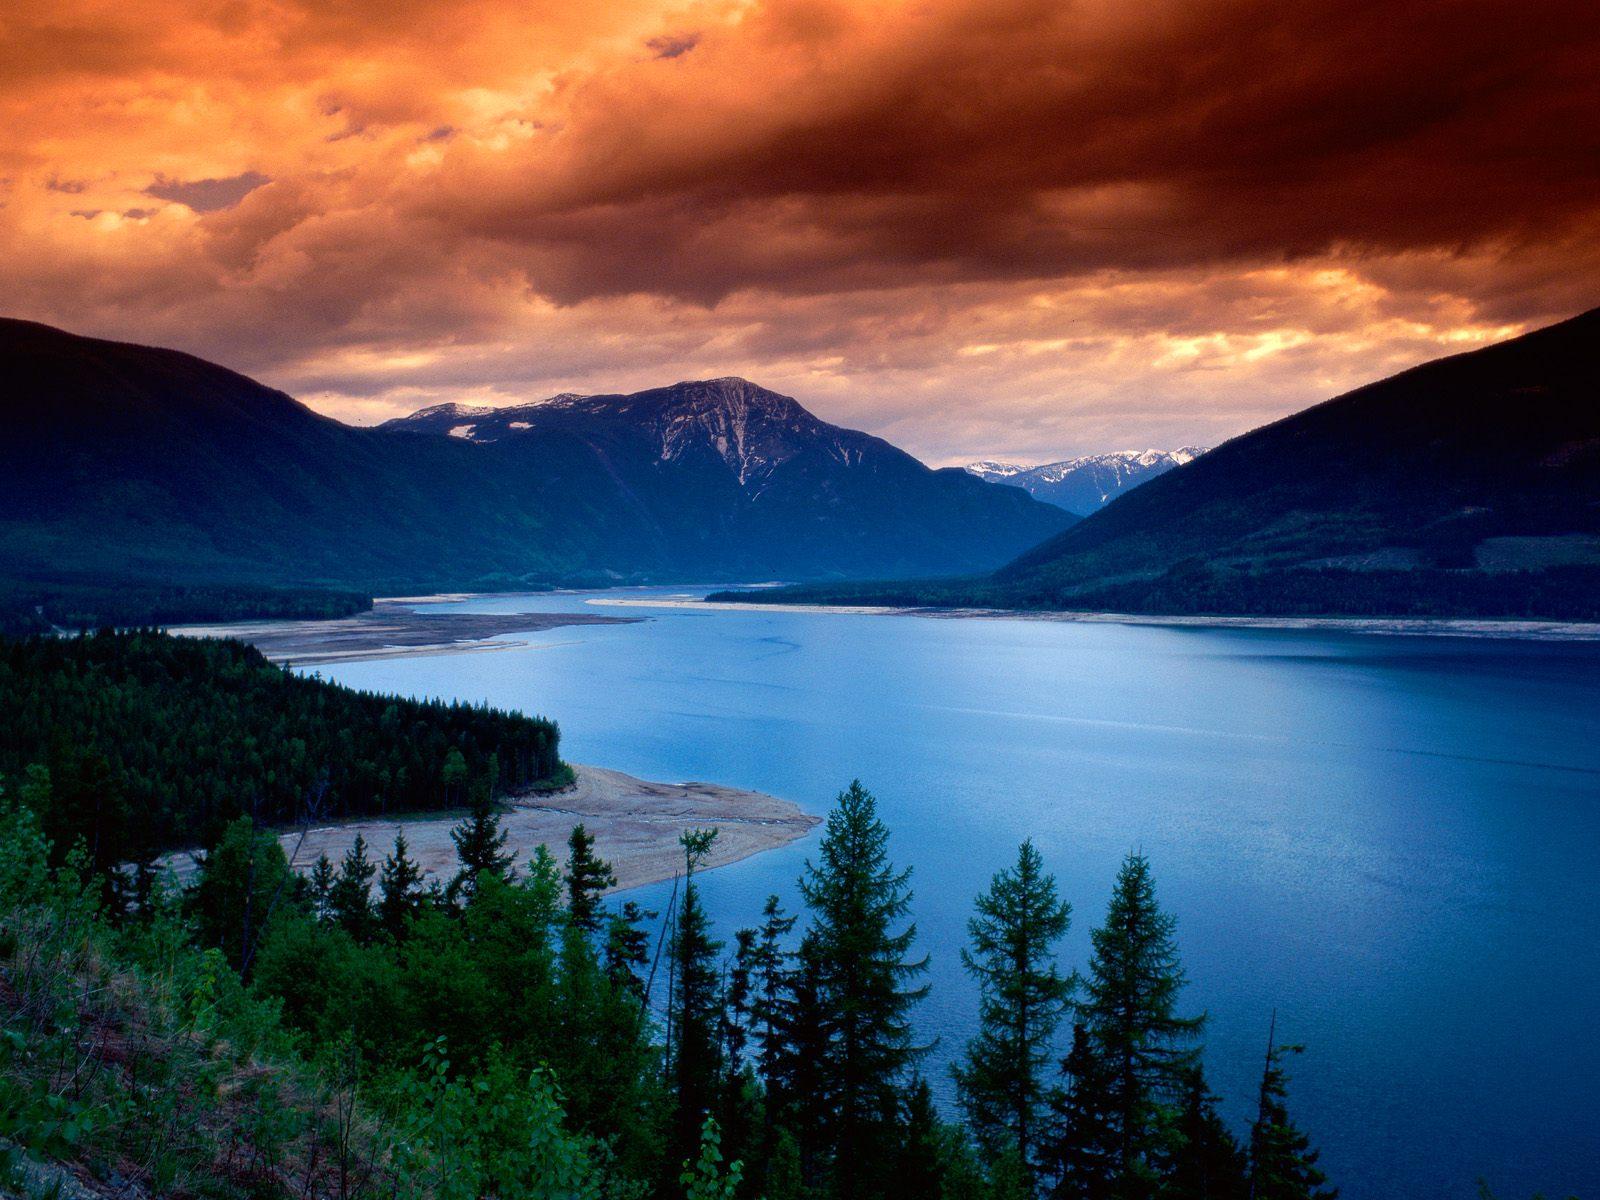 http://2.bp.blogspot.com/_FQx4JXMzHVQ/TMcmHHrN4xI/AAAAAAAAB5Q/ak8KeeblN6E/s1600/Upper_Arrow_Lake%252C_British_Columbia%252C_Canada.jpg